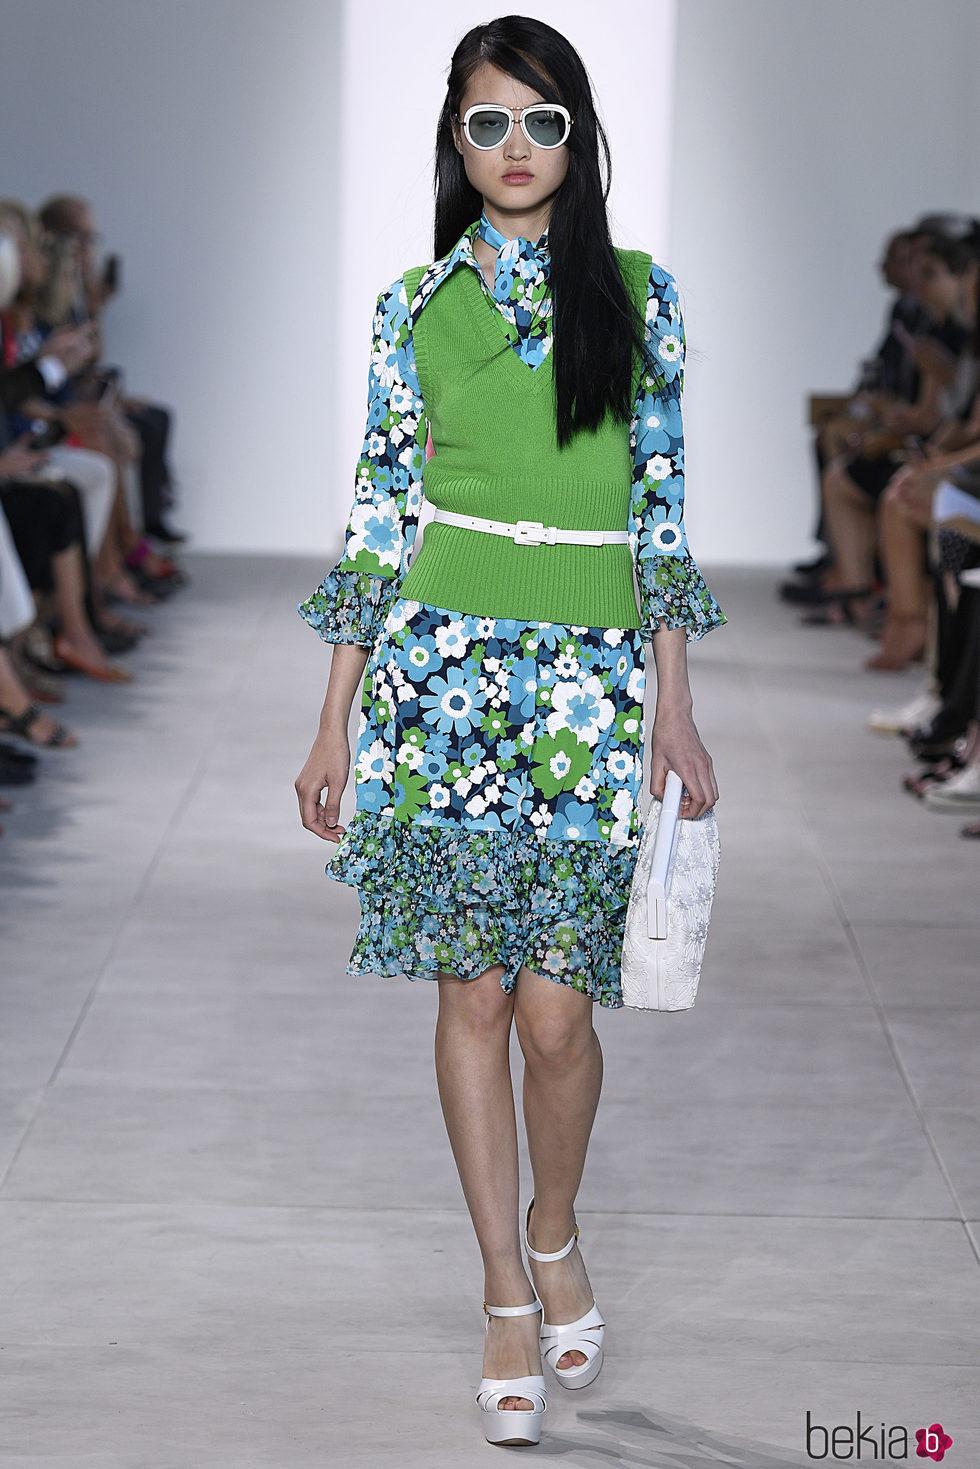 Jersey 'greenery' de Michael Kors primavera/verano 2017 en la New York Fashion Week